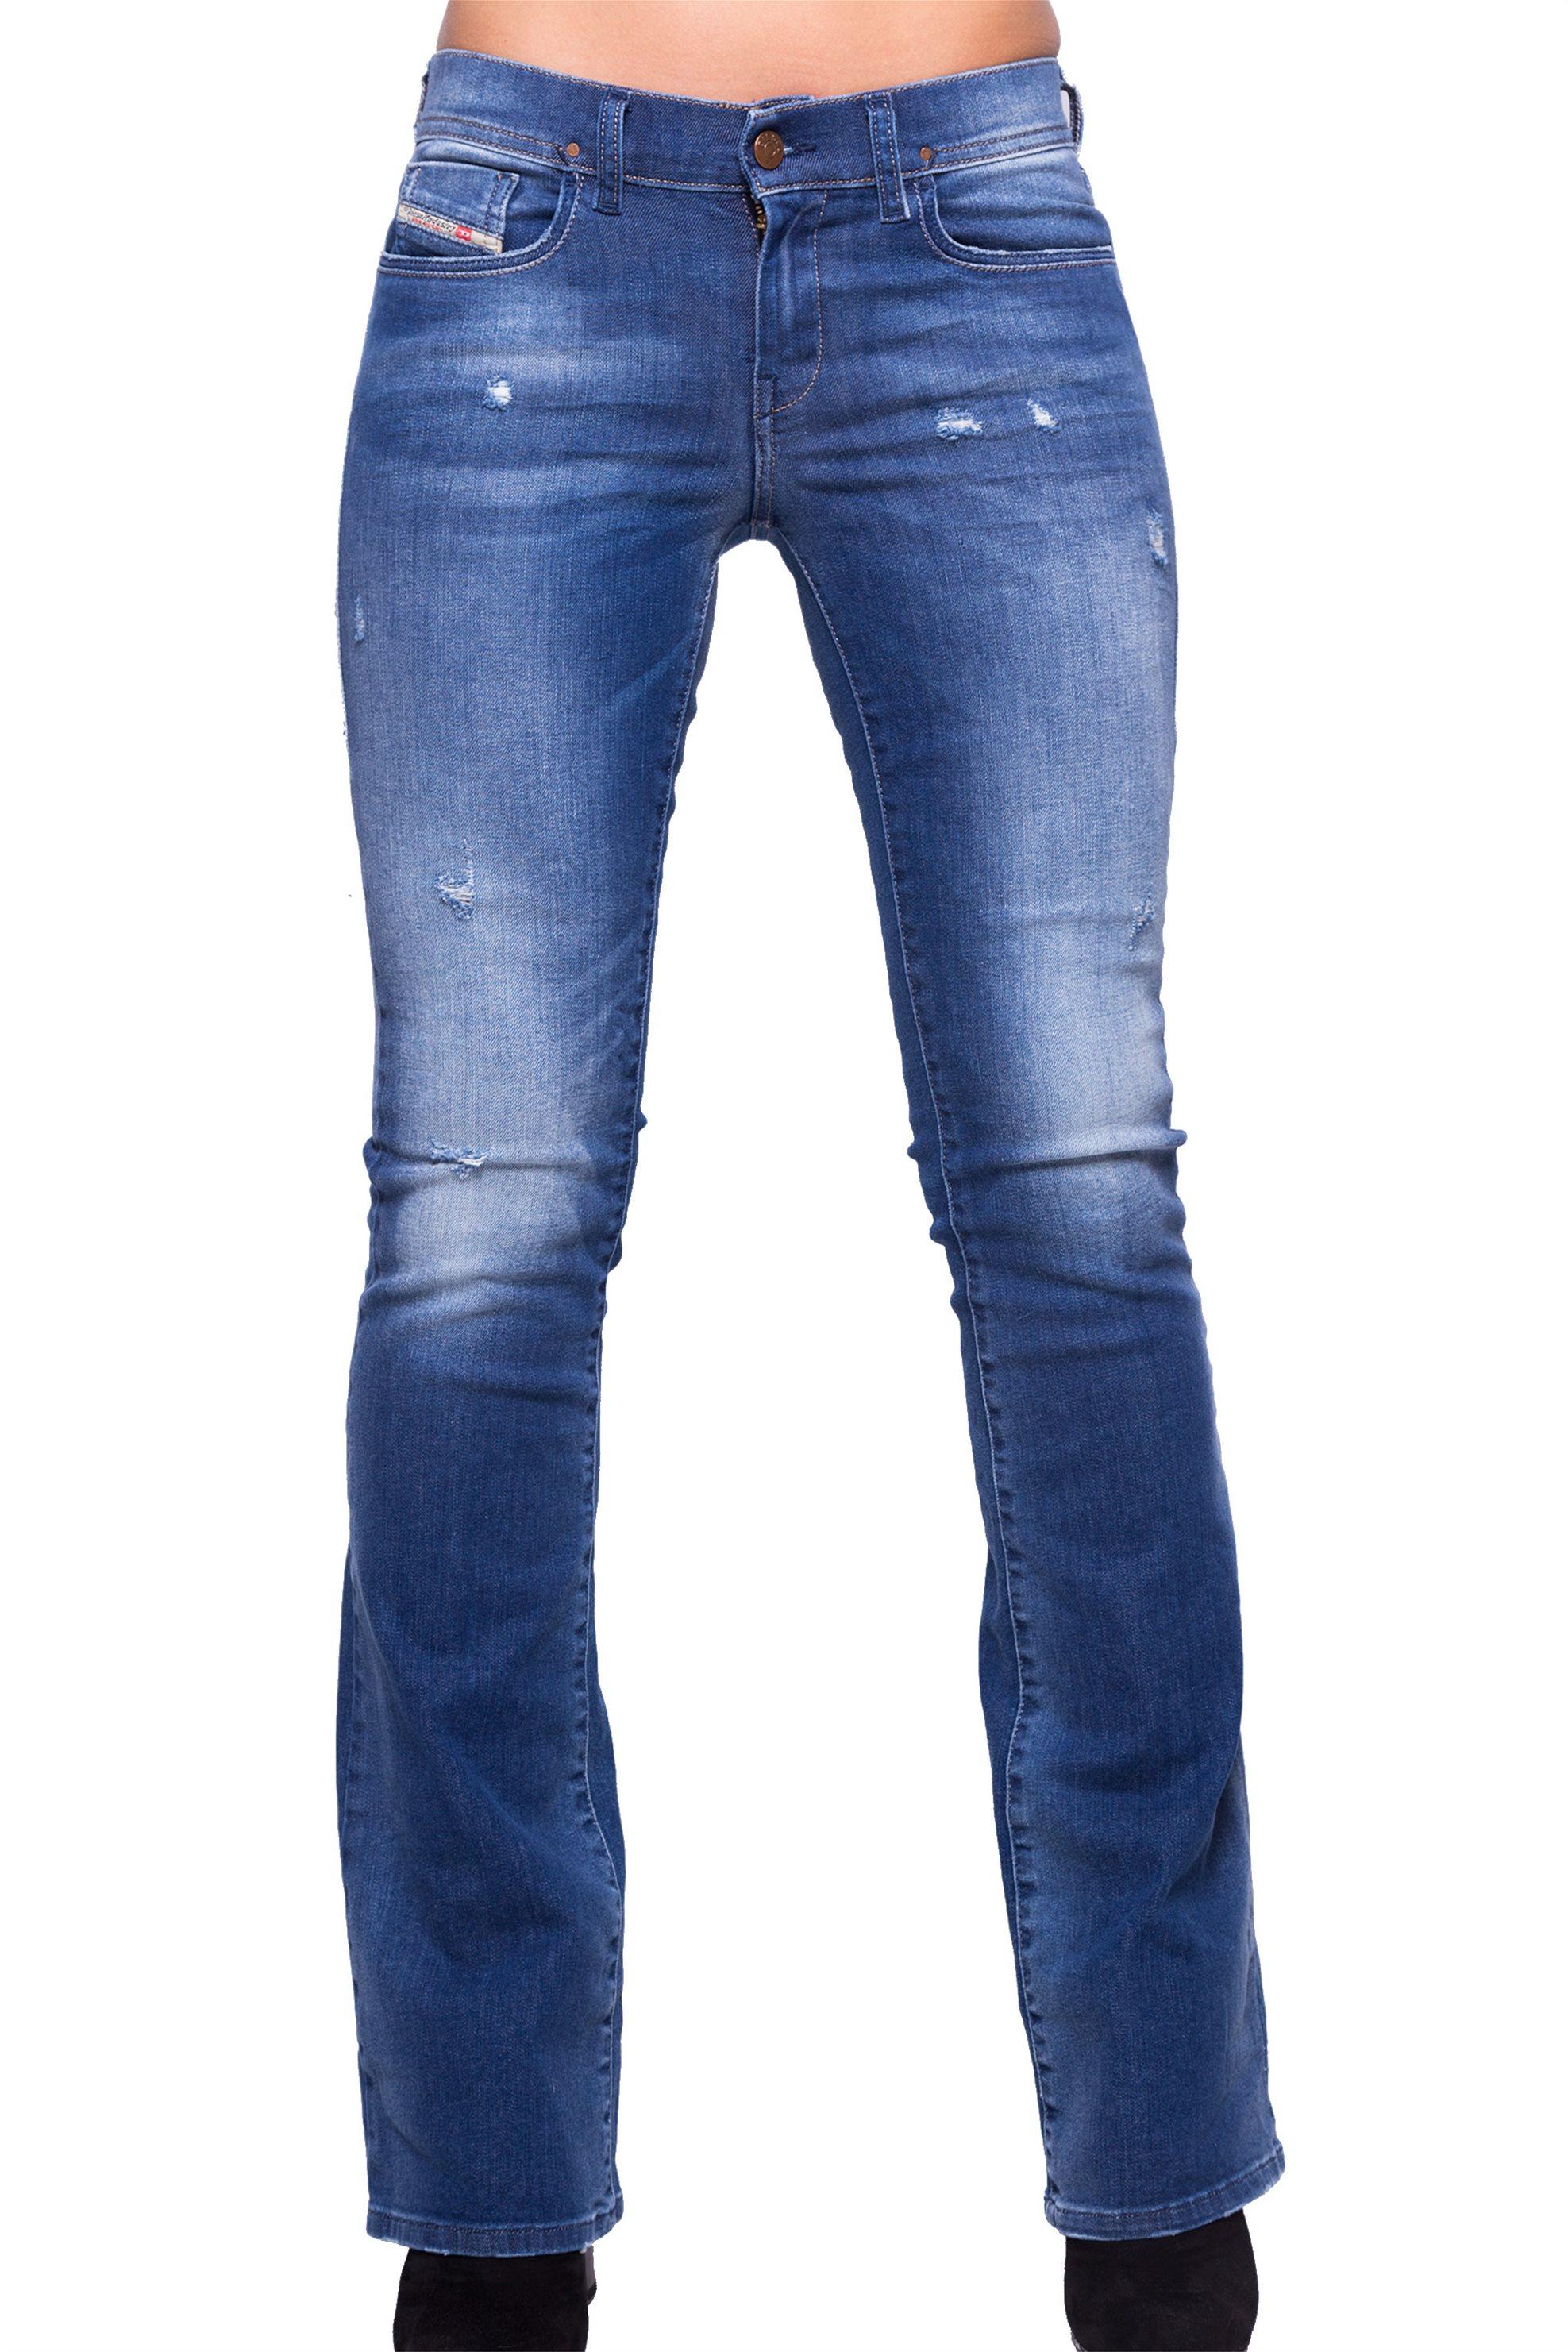 d15f66a1d37 JUICY COUTURE - Γυναικείο jean παντελόνι JUICY DARK RINSE σκούρο μπλε